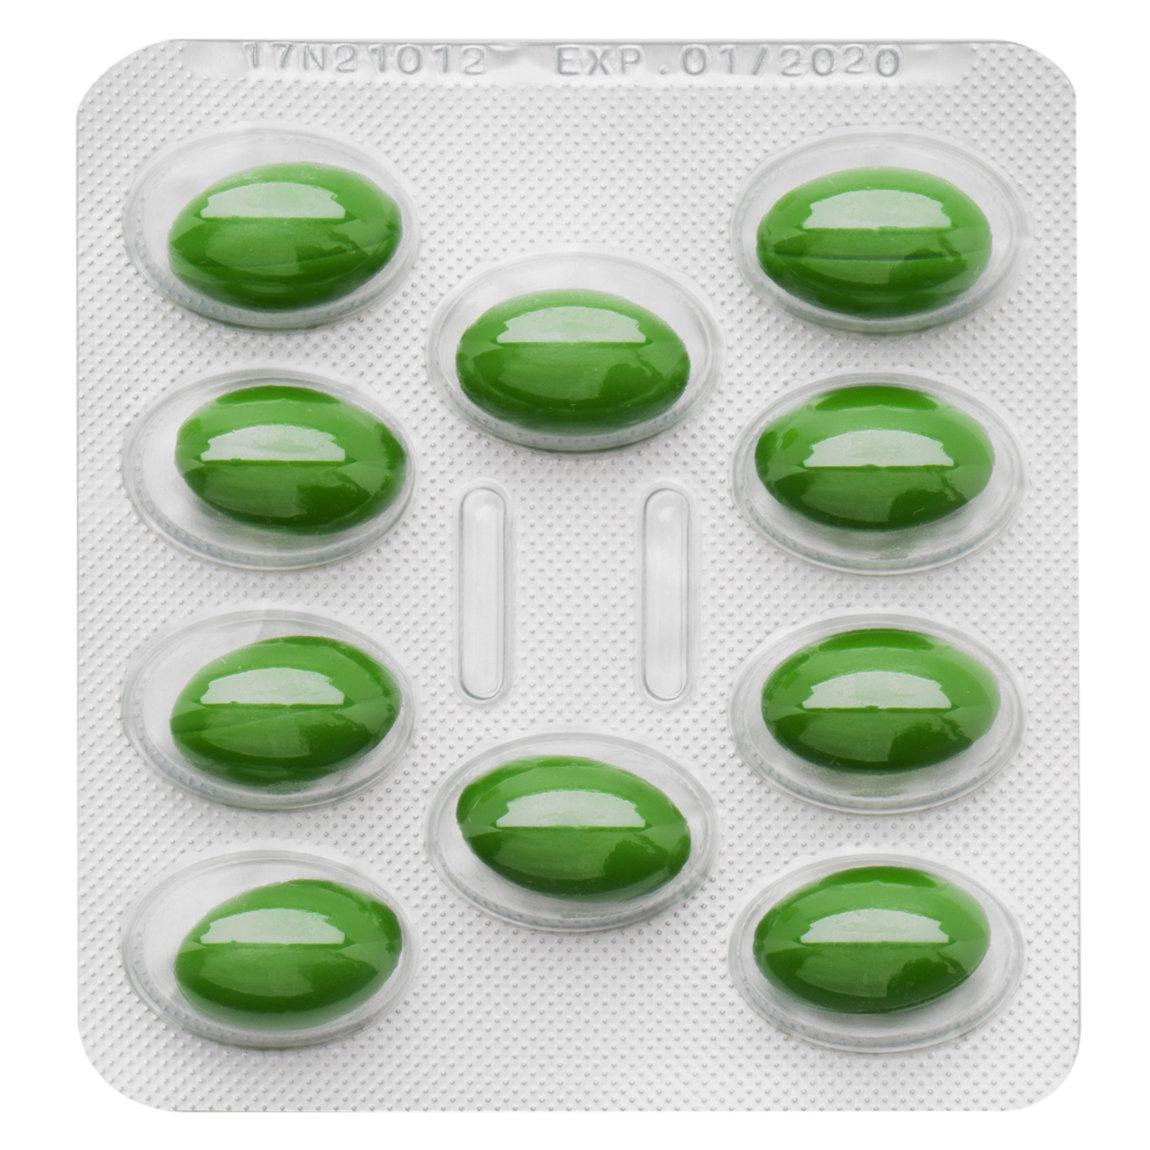 Rene Furterer Vitalfan Dietary Supplement - Sudden, Temporary Thinning Hair product swatch.